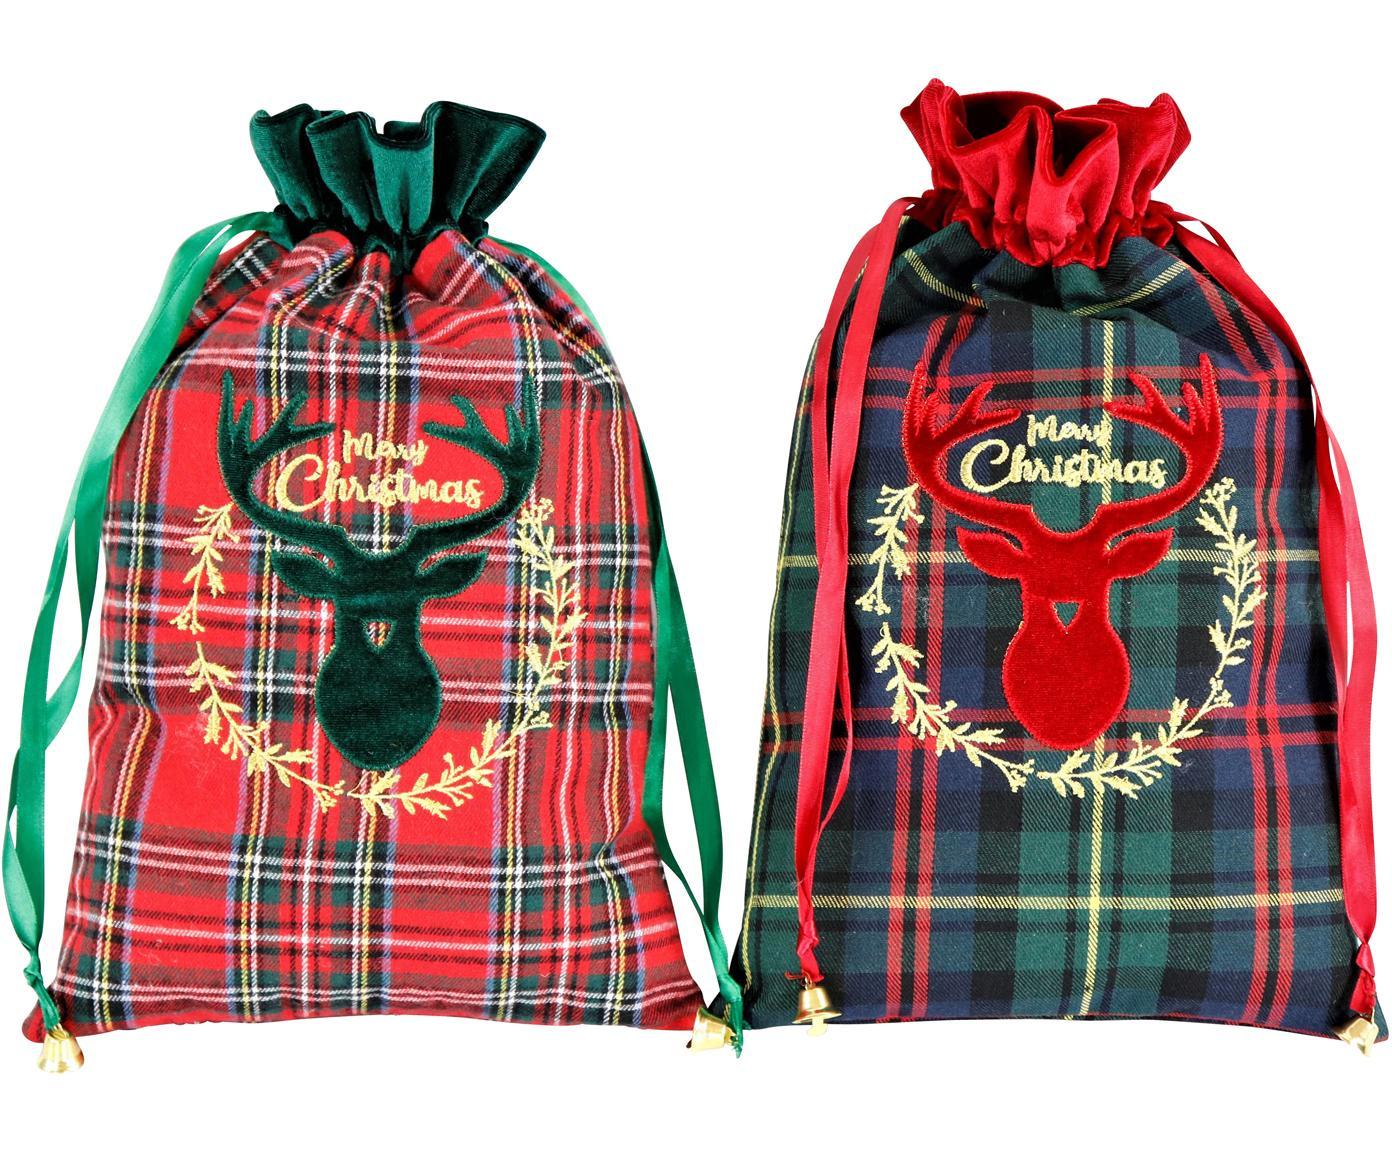 Deko-Objekt-Set Merry Christmas, 2-tlg., Polyester, Baumwolle, Grün, Rot, Schwarz, 22 x 35 cm